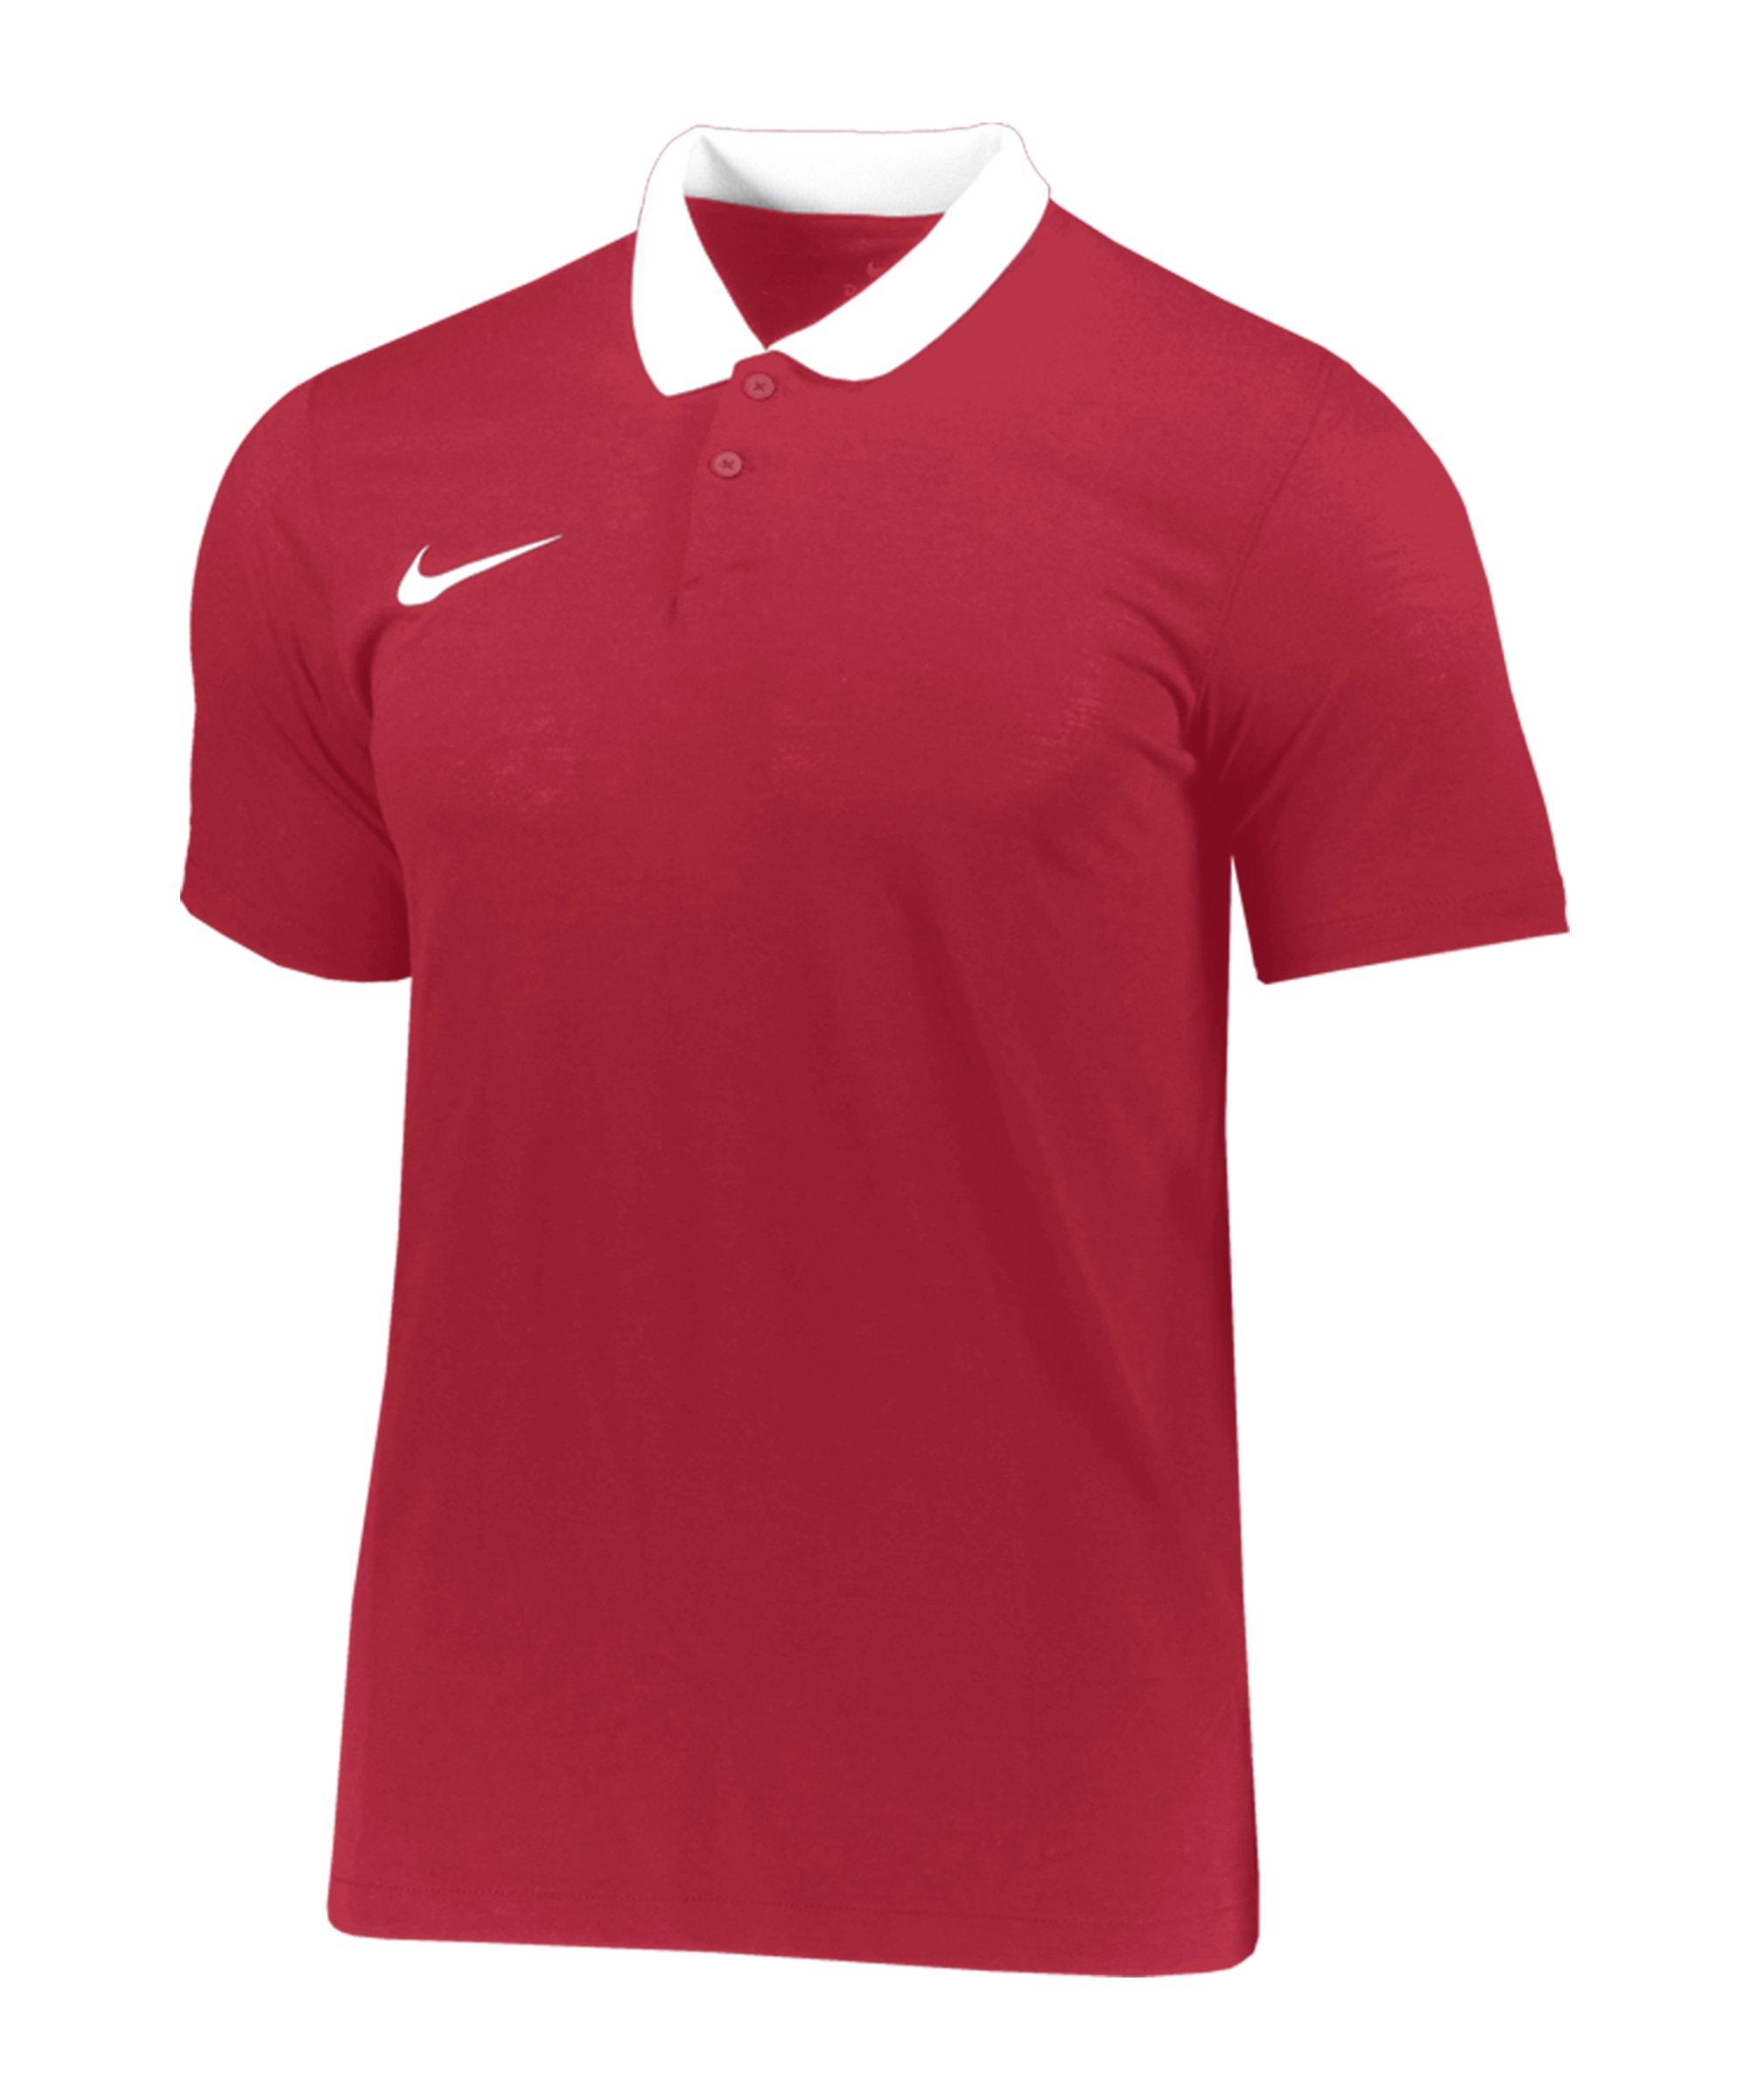 Nike Park 20 Poloshirt Rot Weiss F657 - rot